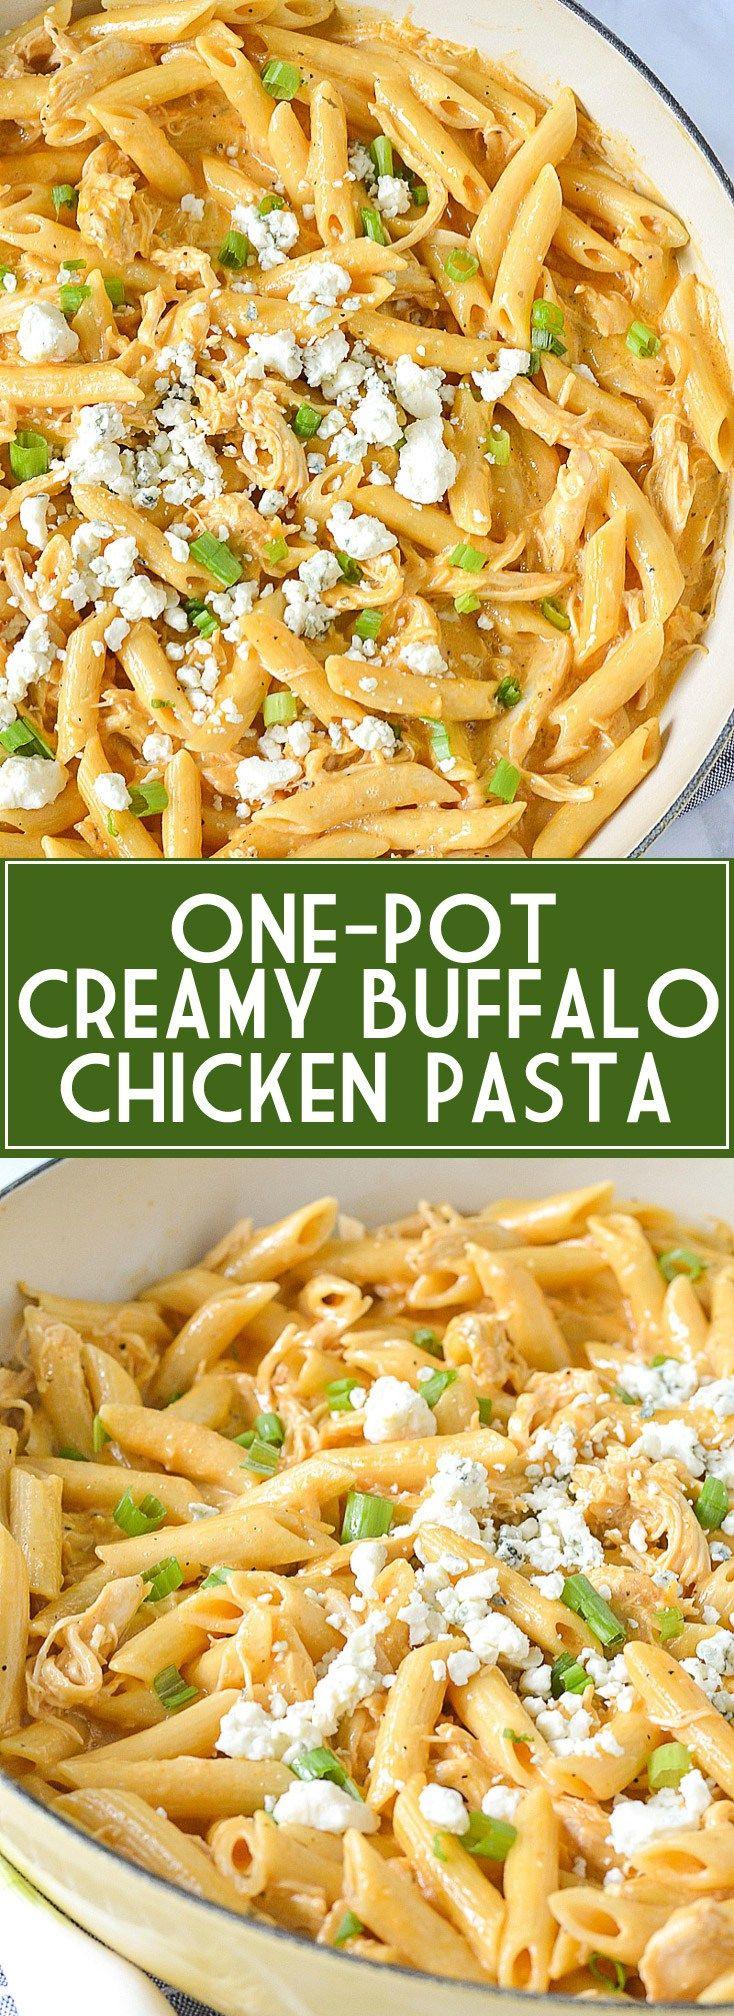 One-Pot Creamy Buffalo Chicken Pasta   www.motherthyme.com